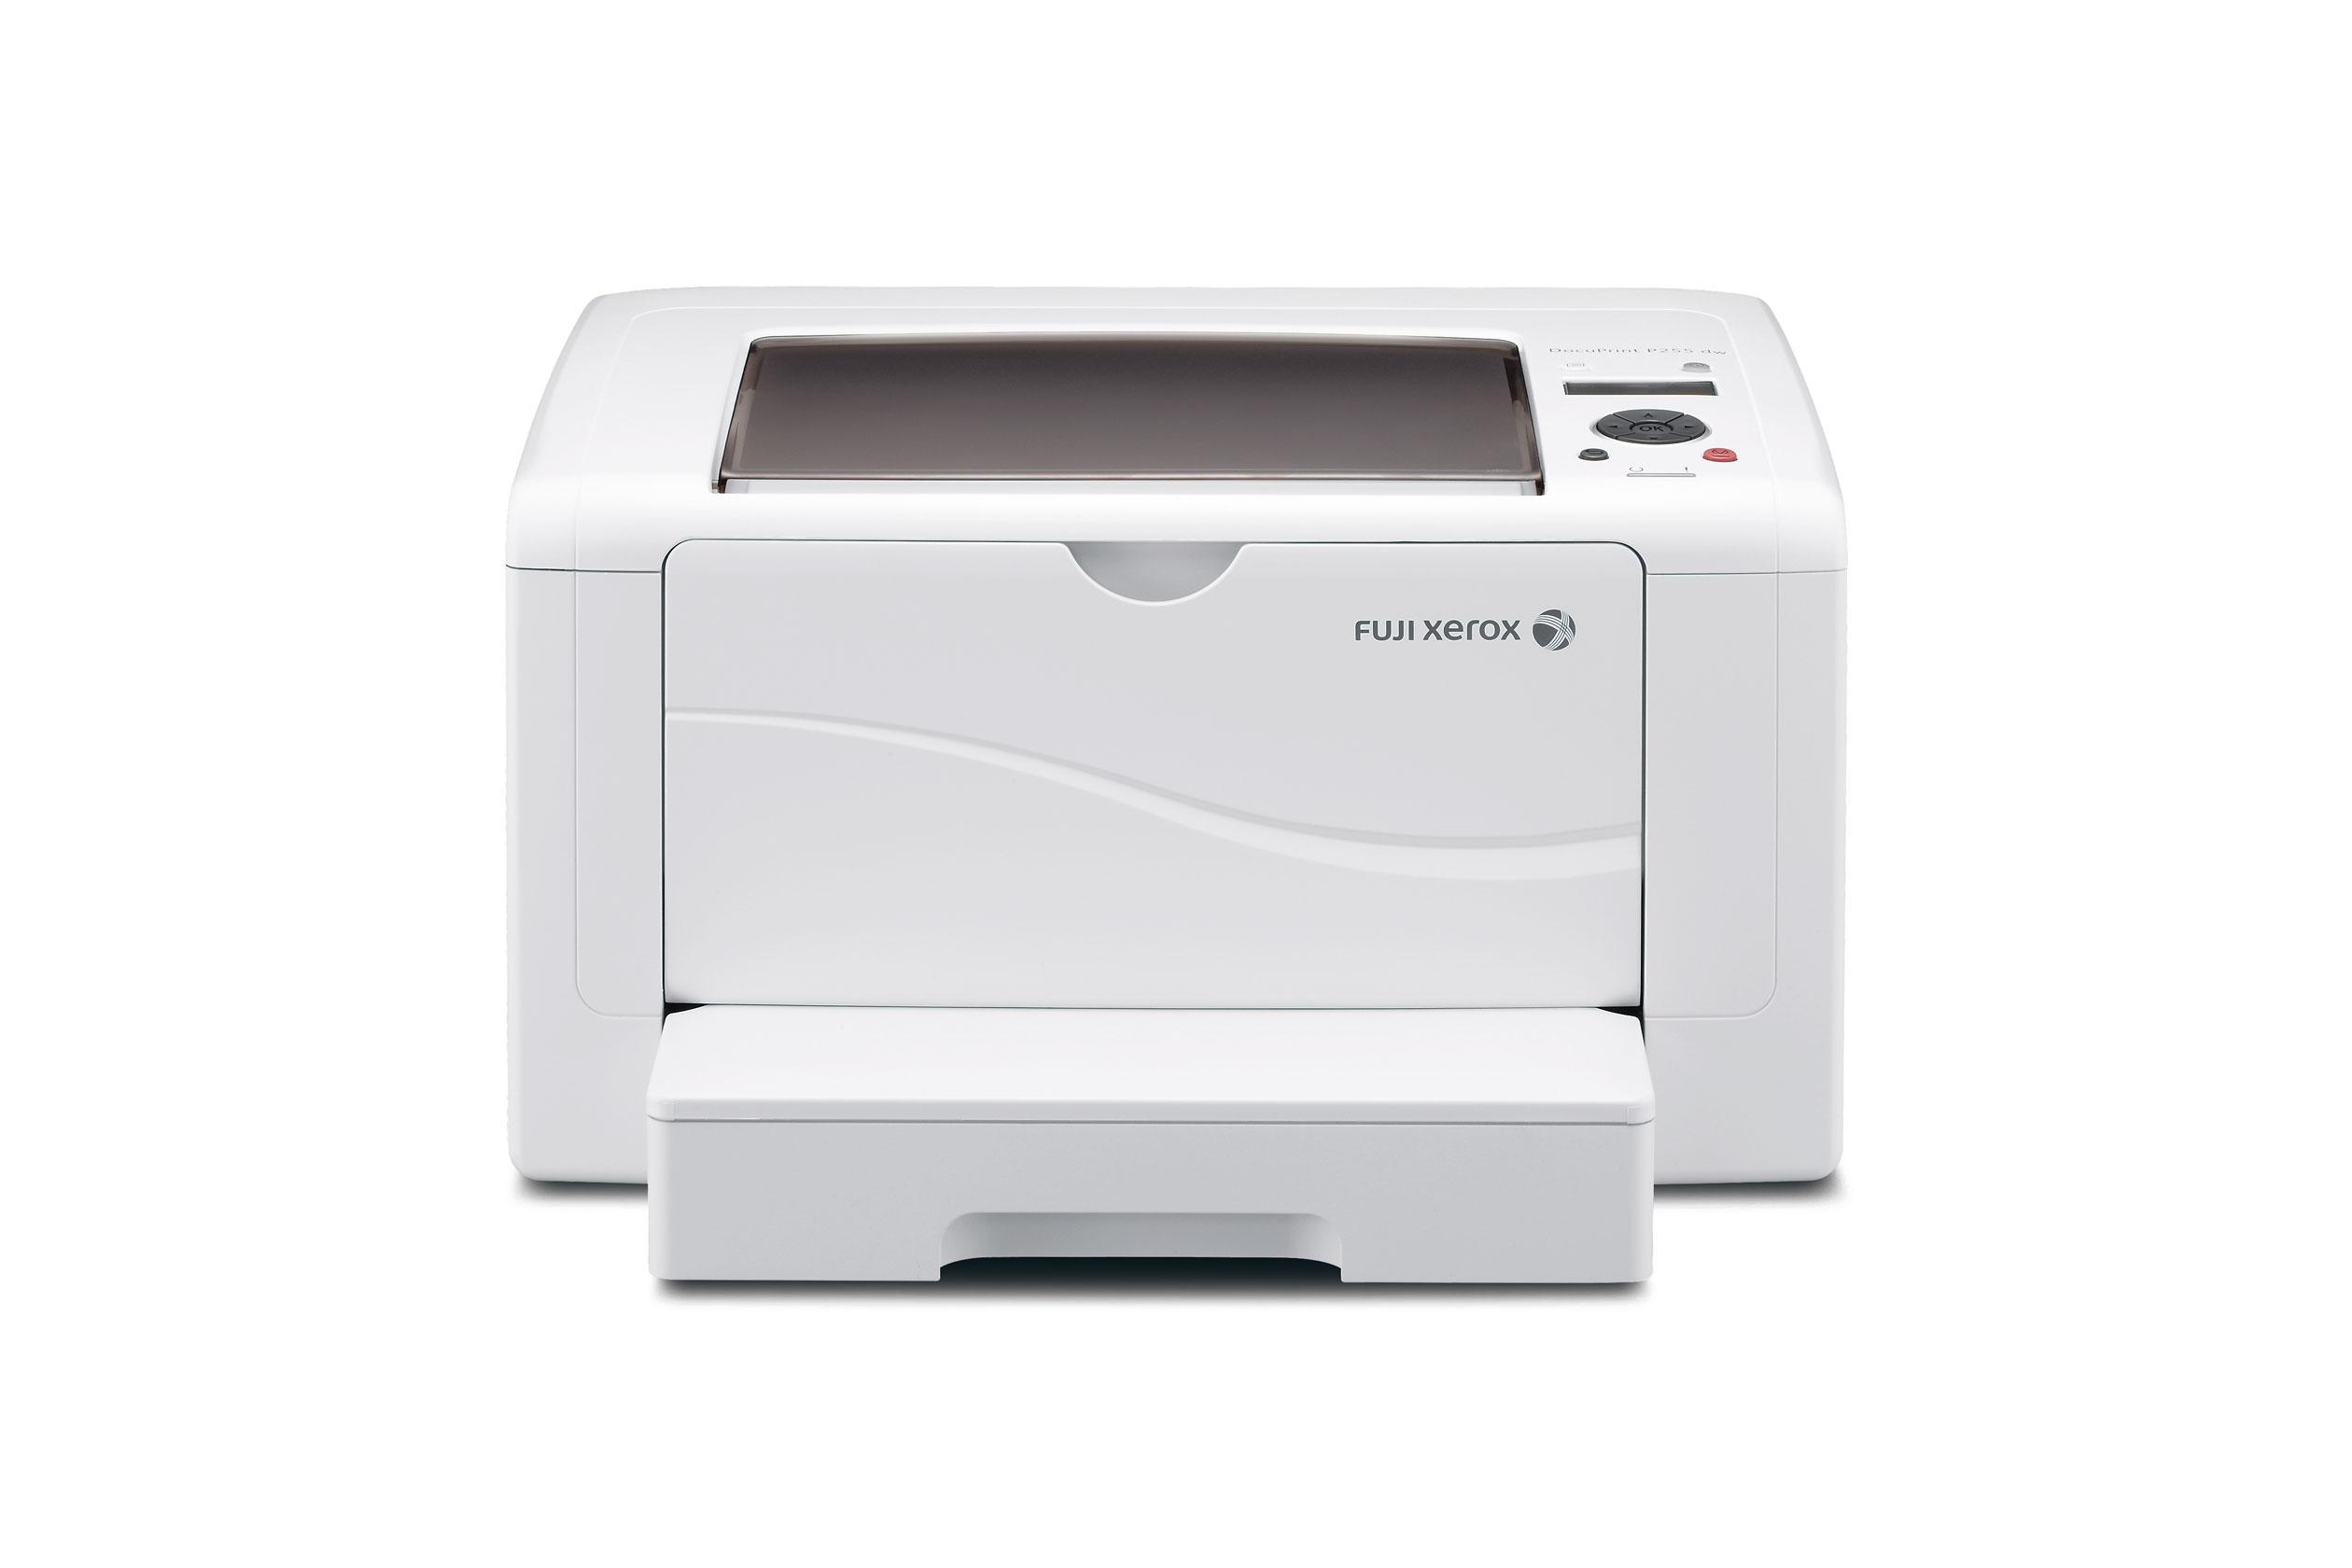 Fuji Xerox P255dw cartridges - CartridgesDirect